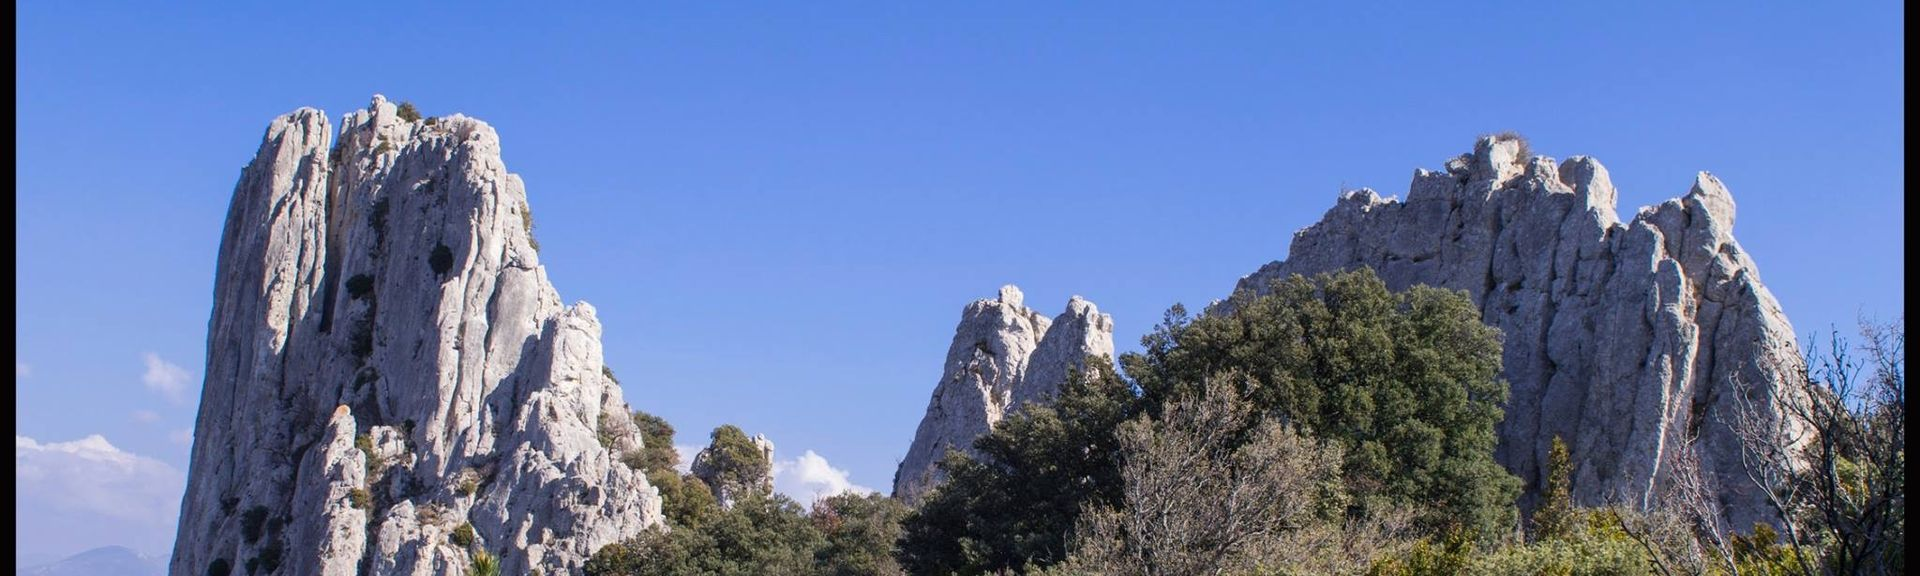 Mont Ventoux, Bedoin, Vaucluse (departement), Frankrijk